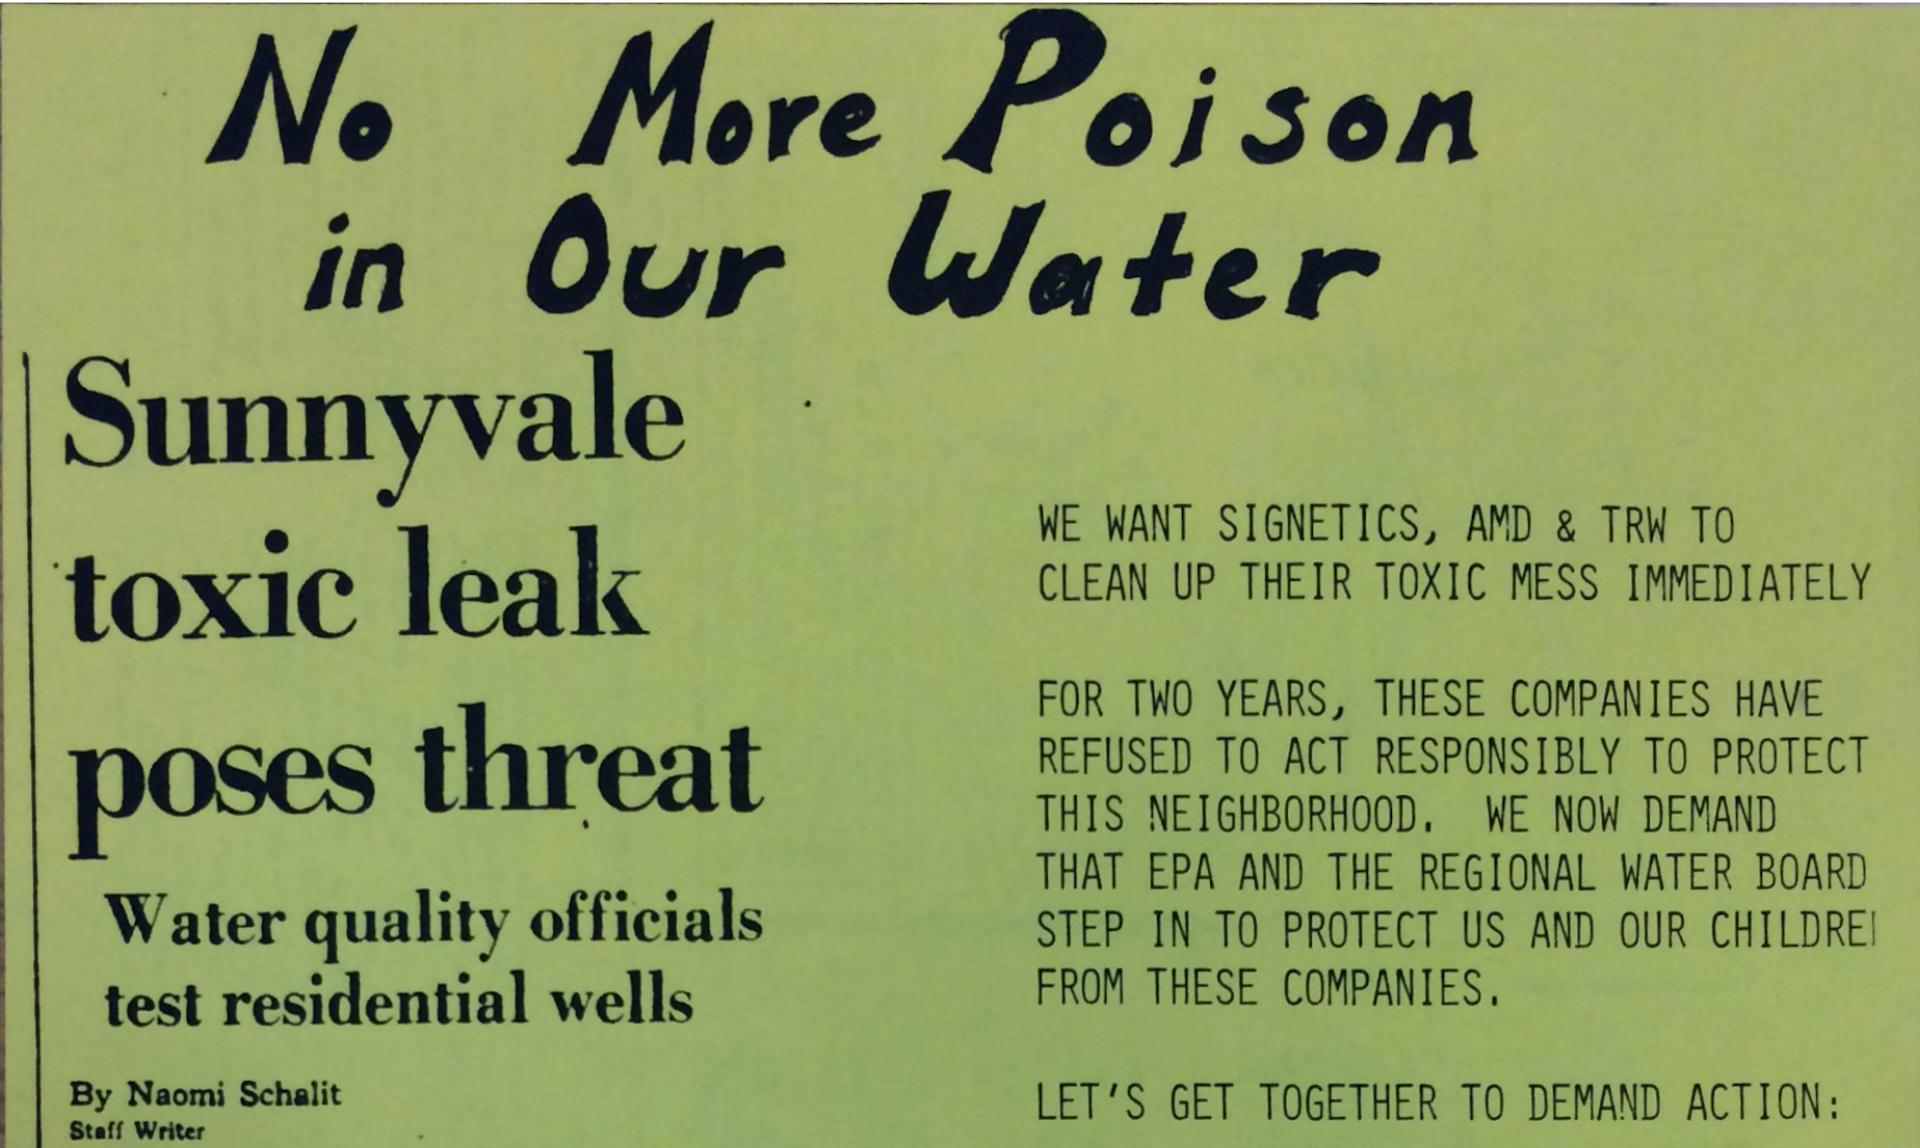 Silicon Valley Toxics Coalition flyer.  Folder 3, Box 11, Silicon Valley Toxics Coalition Papers, San Jose State University